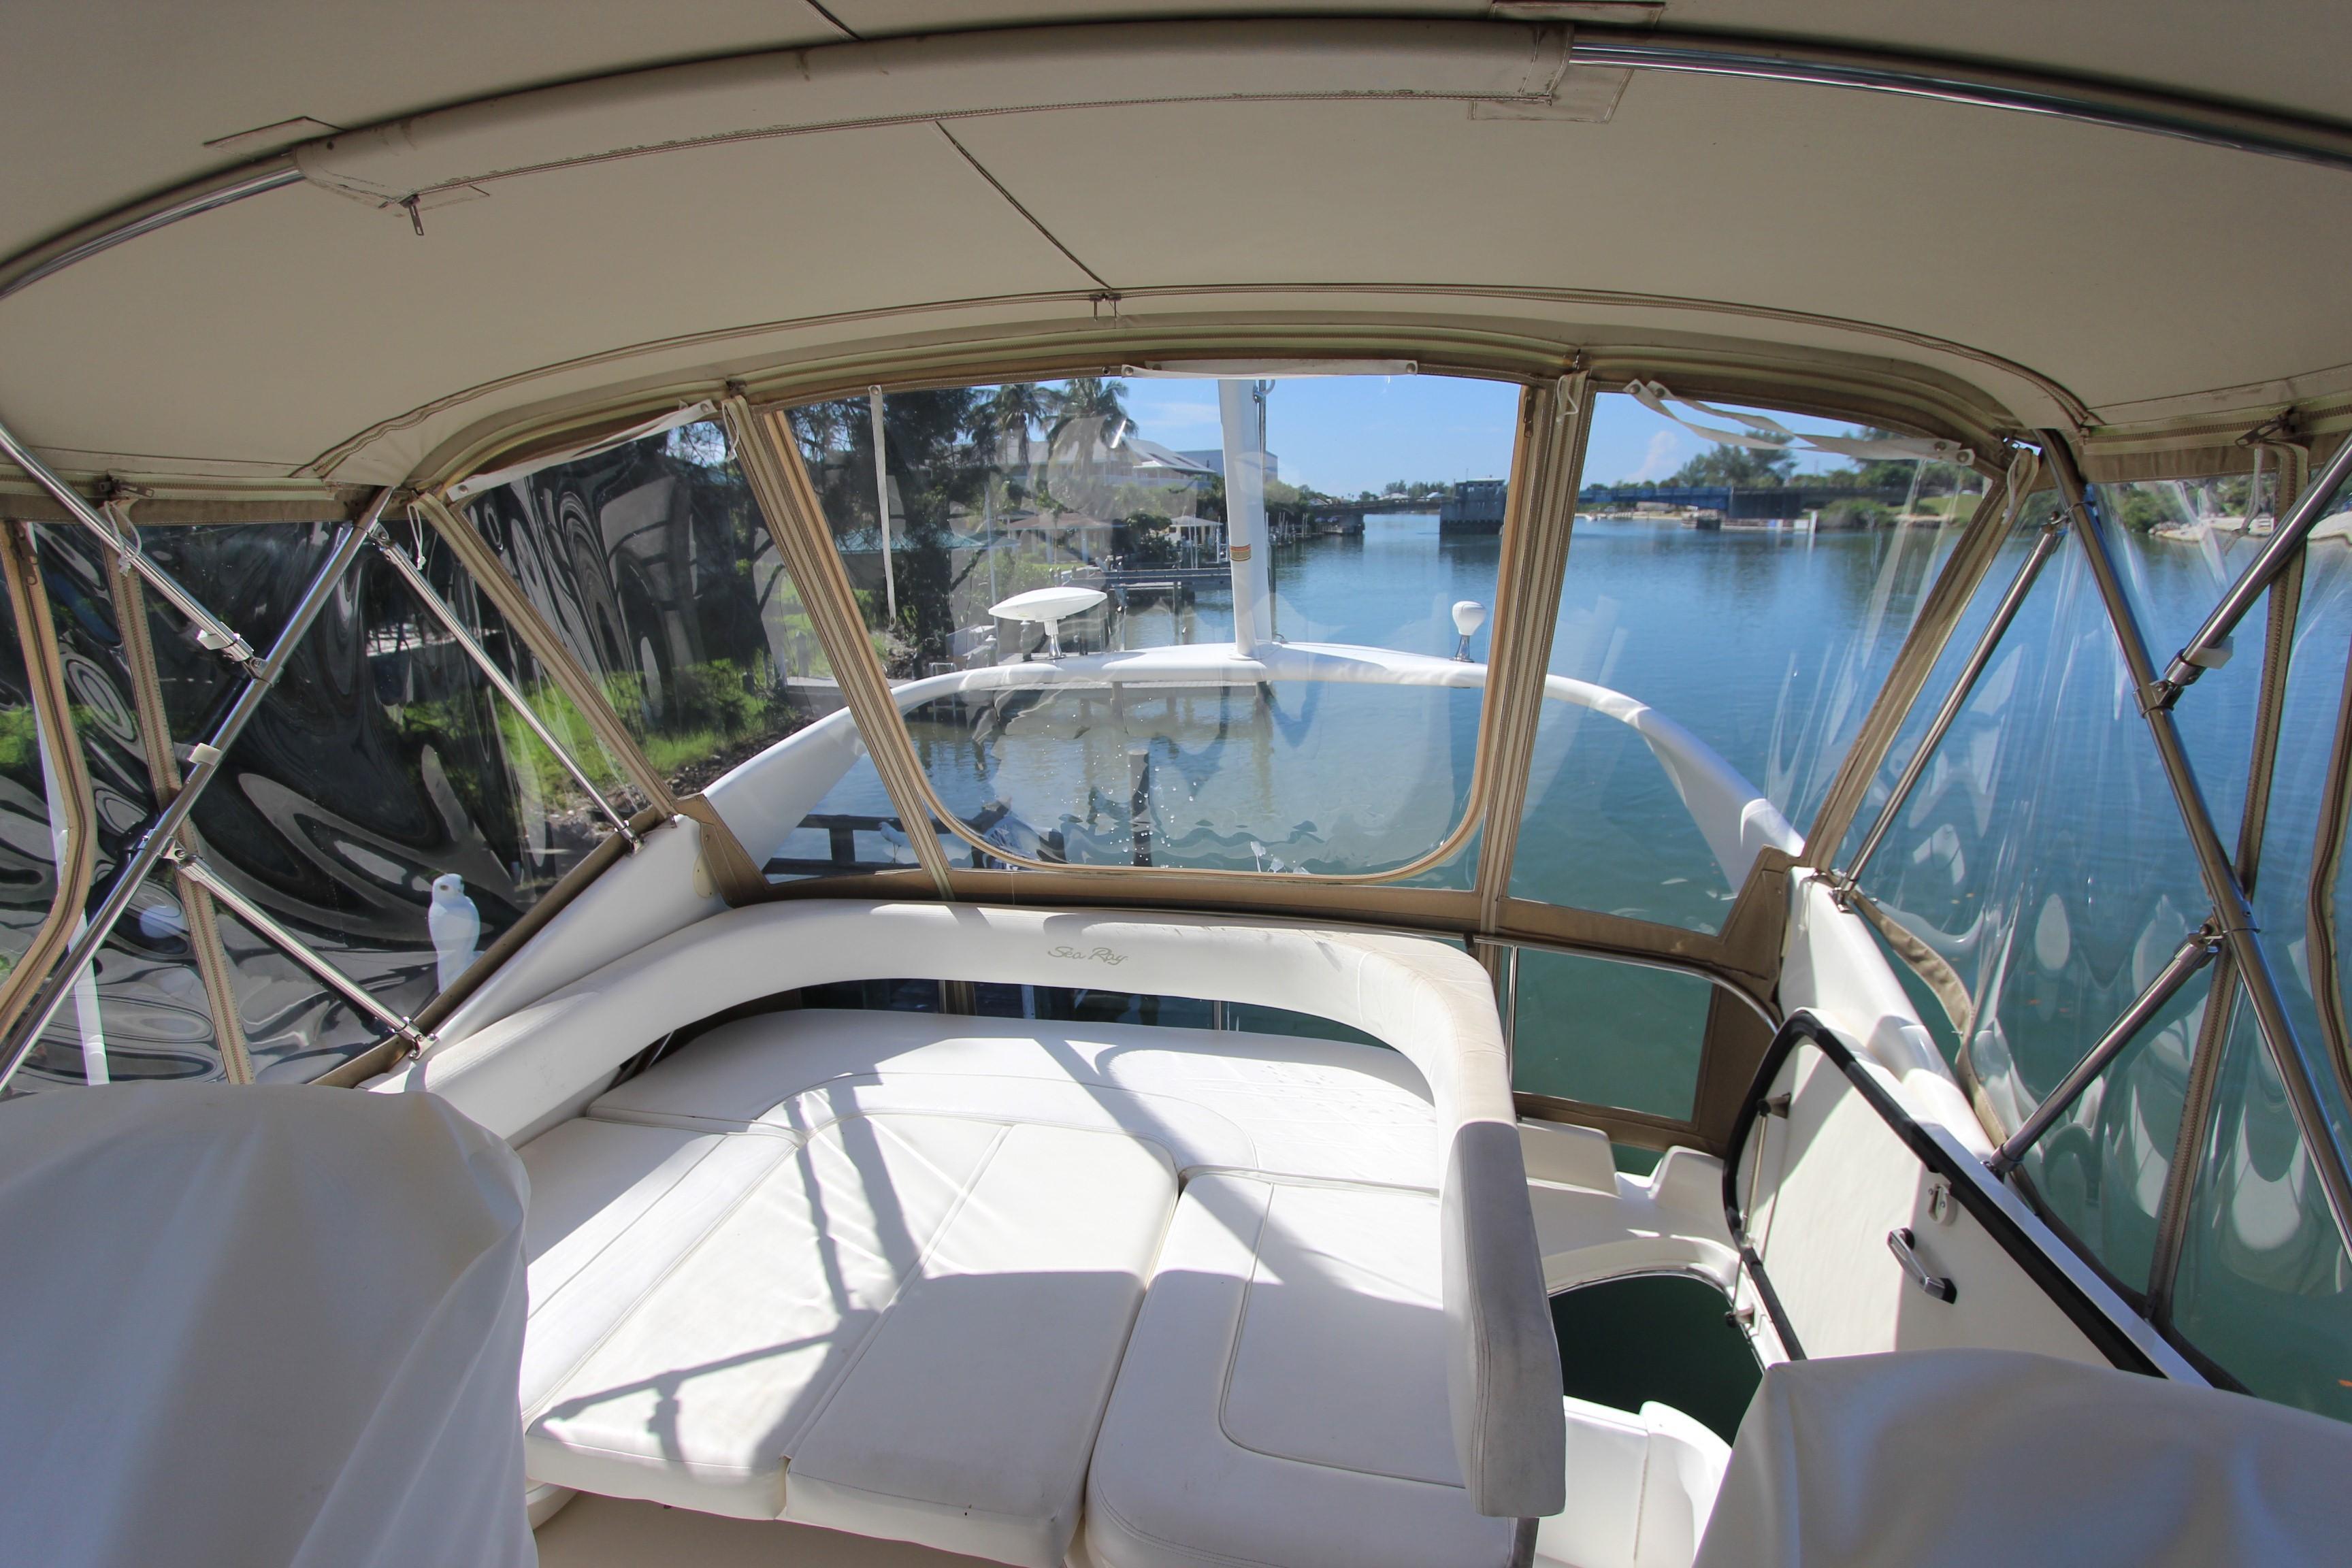 6338999_20170817104408118_1_XLARGE&w=924&h=693&t=1502995534000 2003 sea ray 400 sedan bridge power boat for sale www yachtworld com  at webbmarketing.co